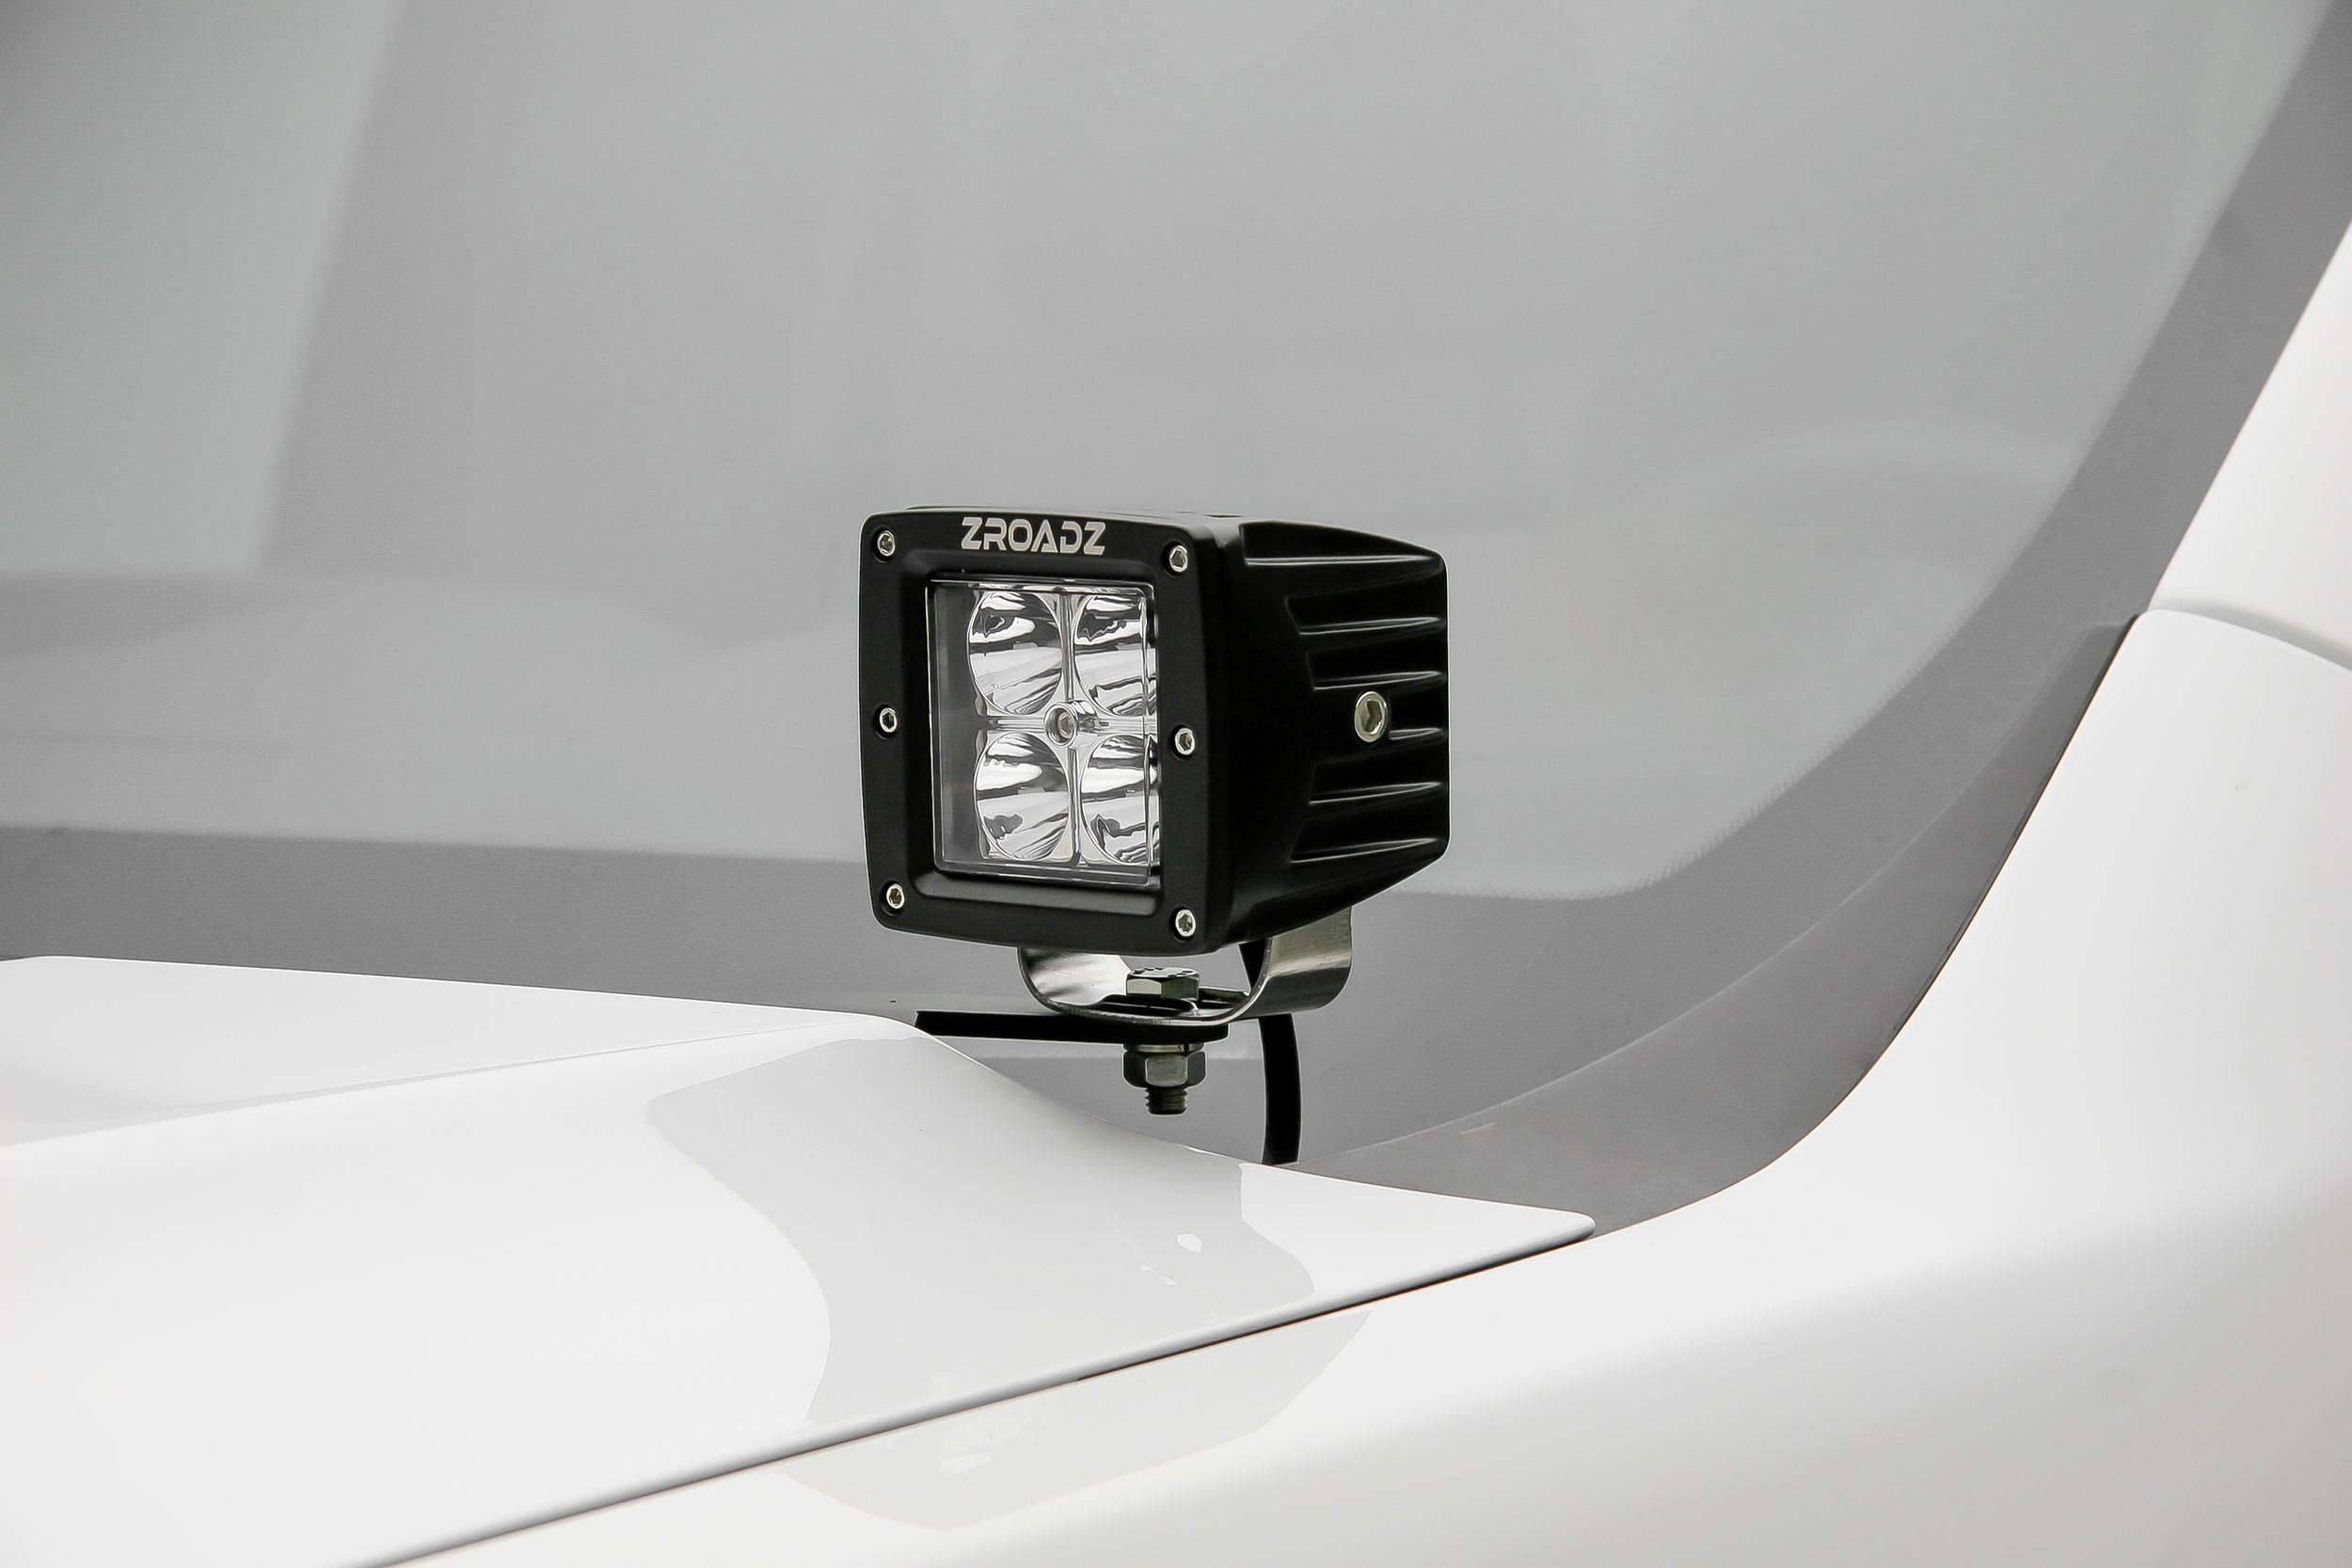 ZROADZ OFF ROAD PRODUCTS - 2007-2013 Silverado, Sierra 1500 Hood Hinge LED Kit with (2) 3 Inch LED Pod Lights - PN #Z362051-KIT2